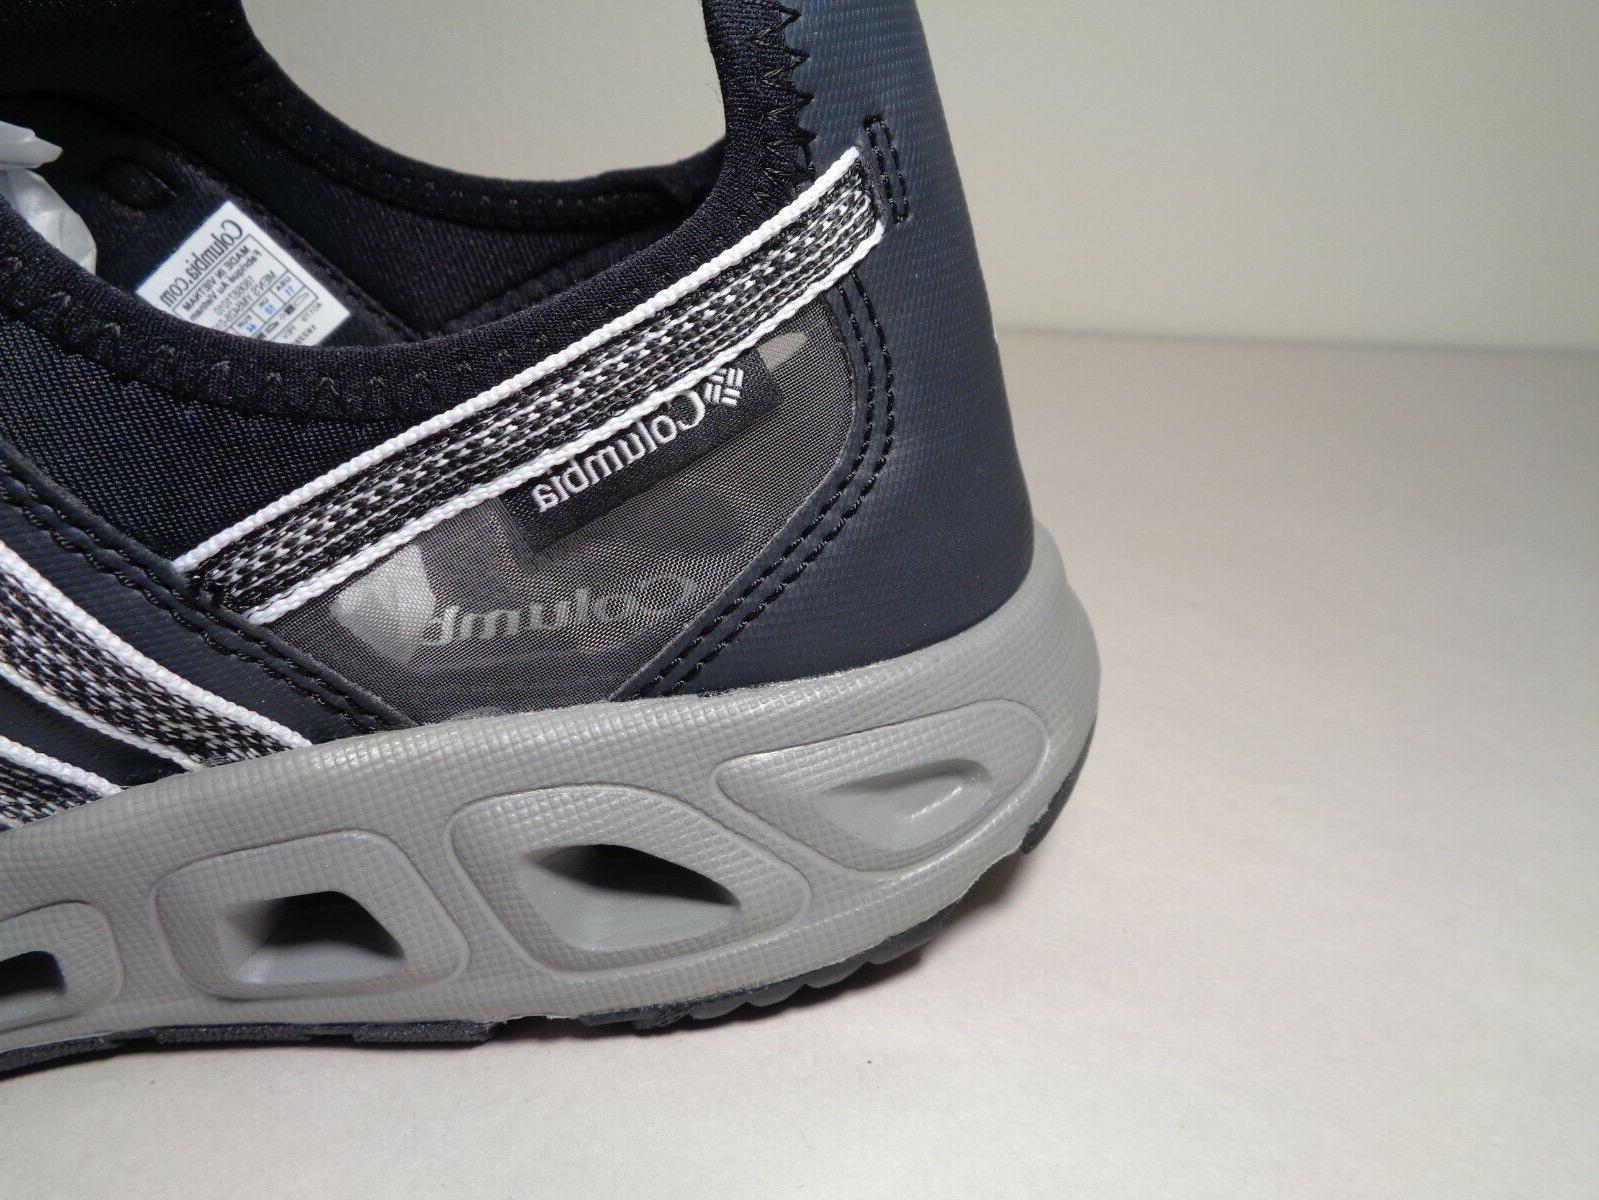 Columbia OKOLONA Black Sneakers New Men's Shoes